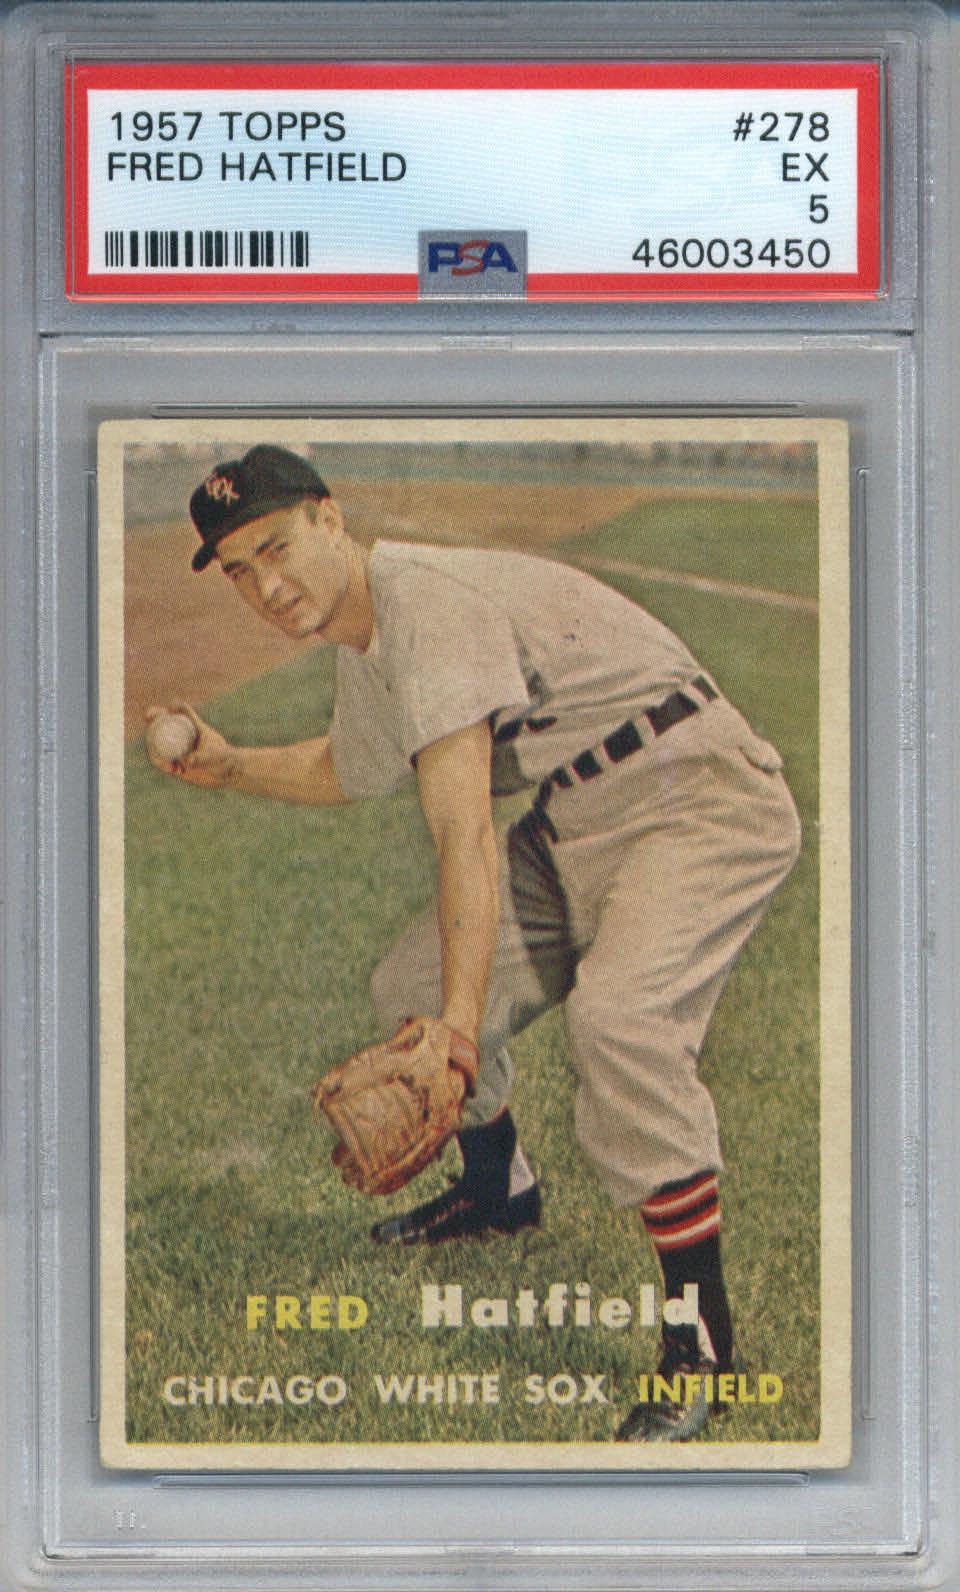 1957 Topps #278 Fred Hatfield PSA 5